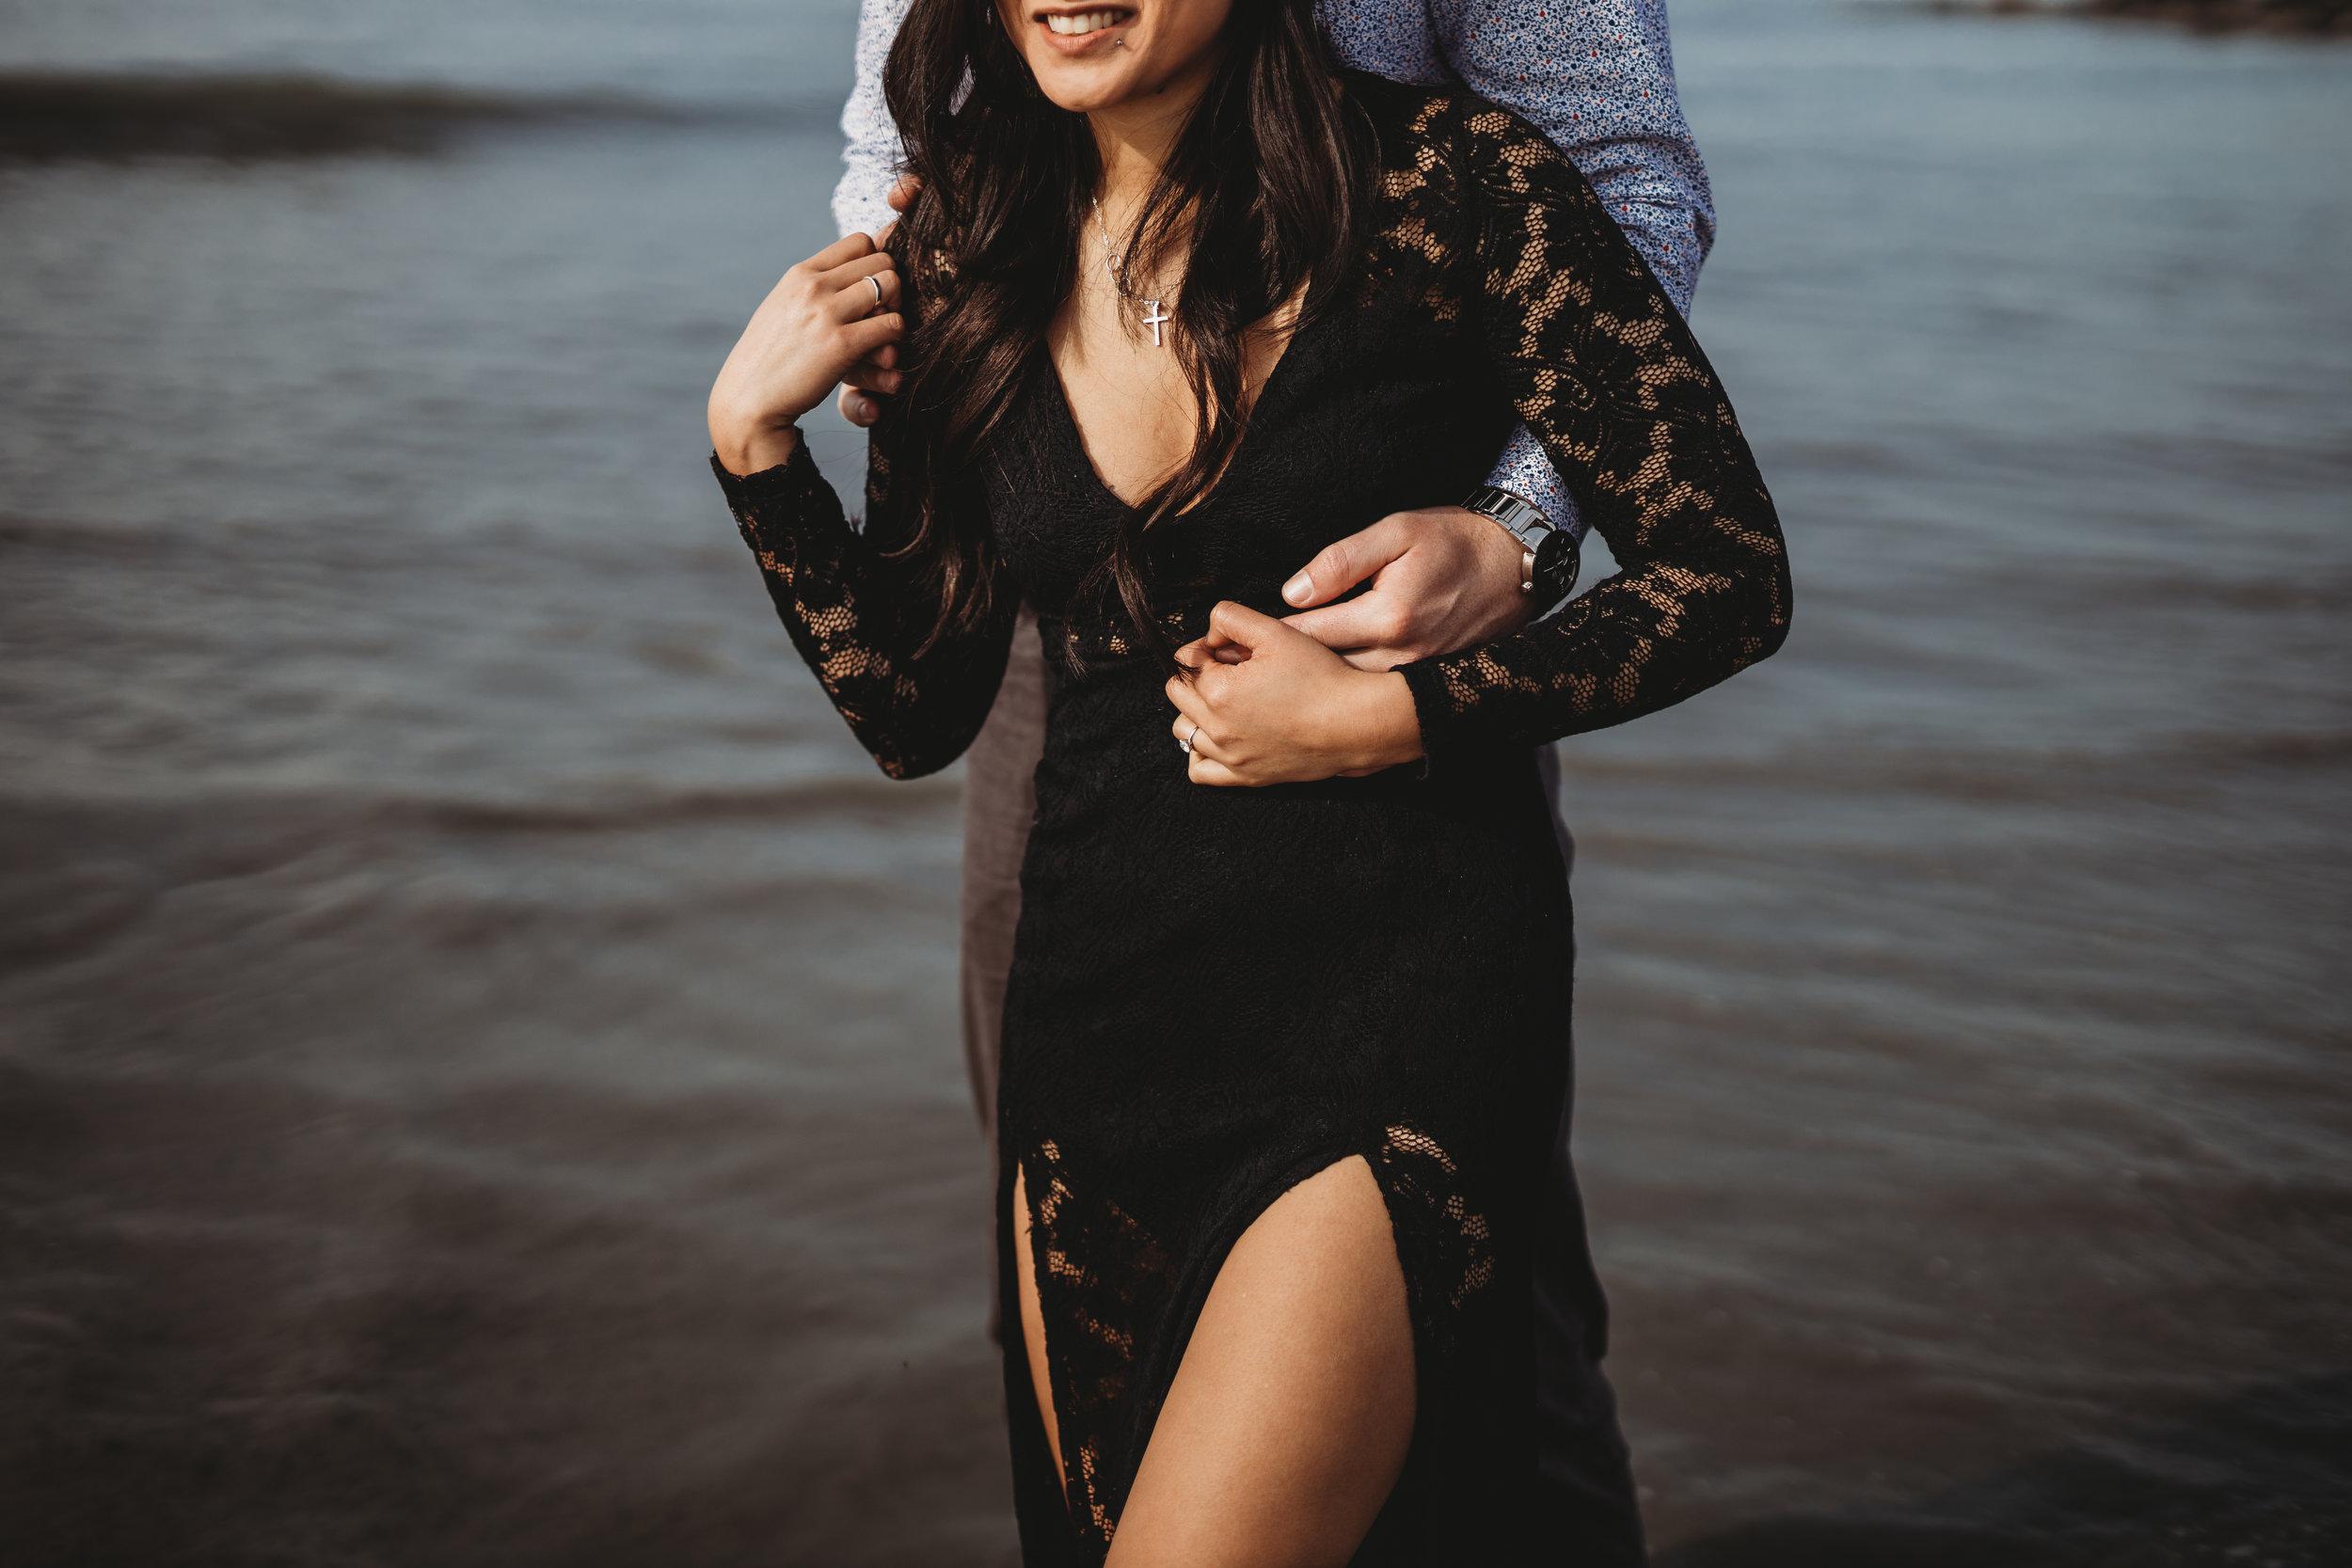 BEACH-conway-central-arkansas-bridal-photographer-little-rock-photography-outdoor-wedding-boho-fashion-engagement-elopement-bouquet-bride-soiree-magazine-photoshoot-arkansasbride-pinnacle-mountain-car-vintage